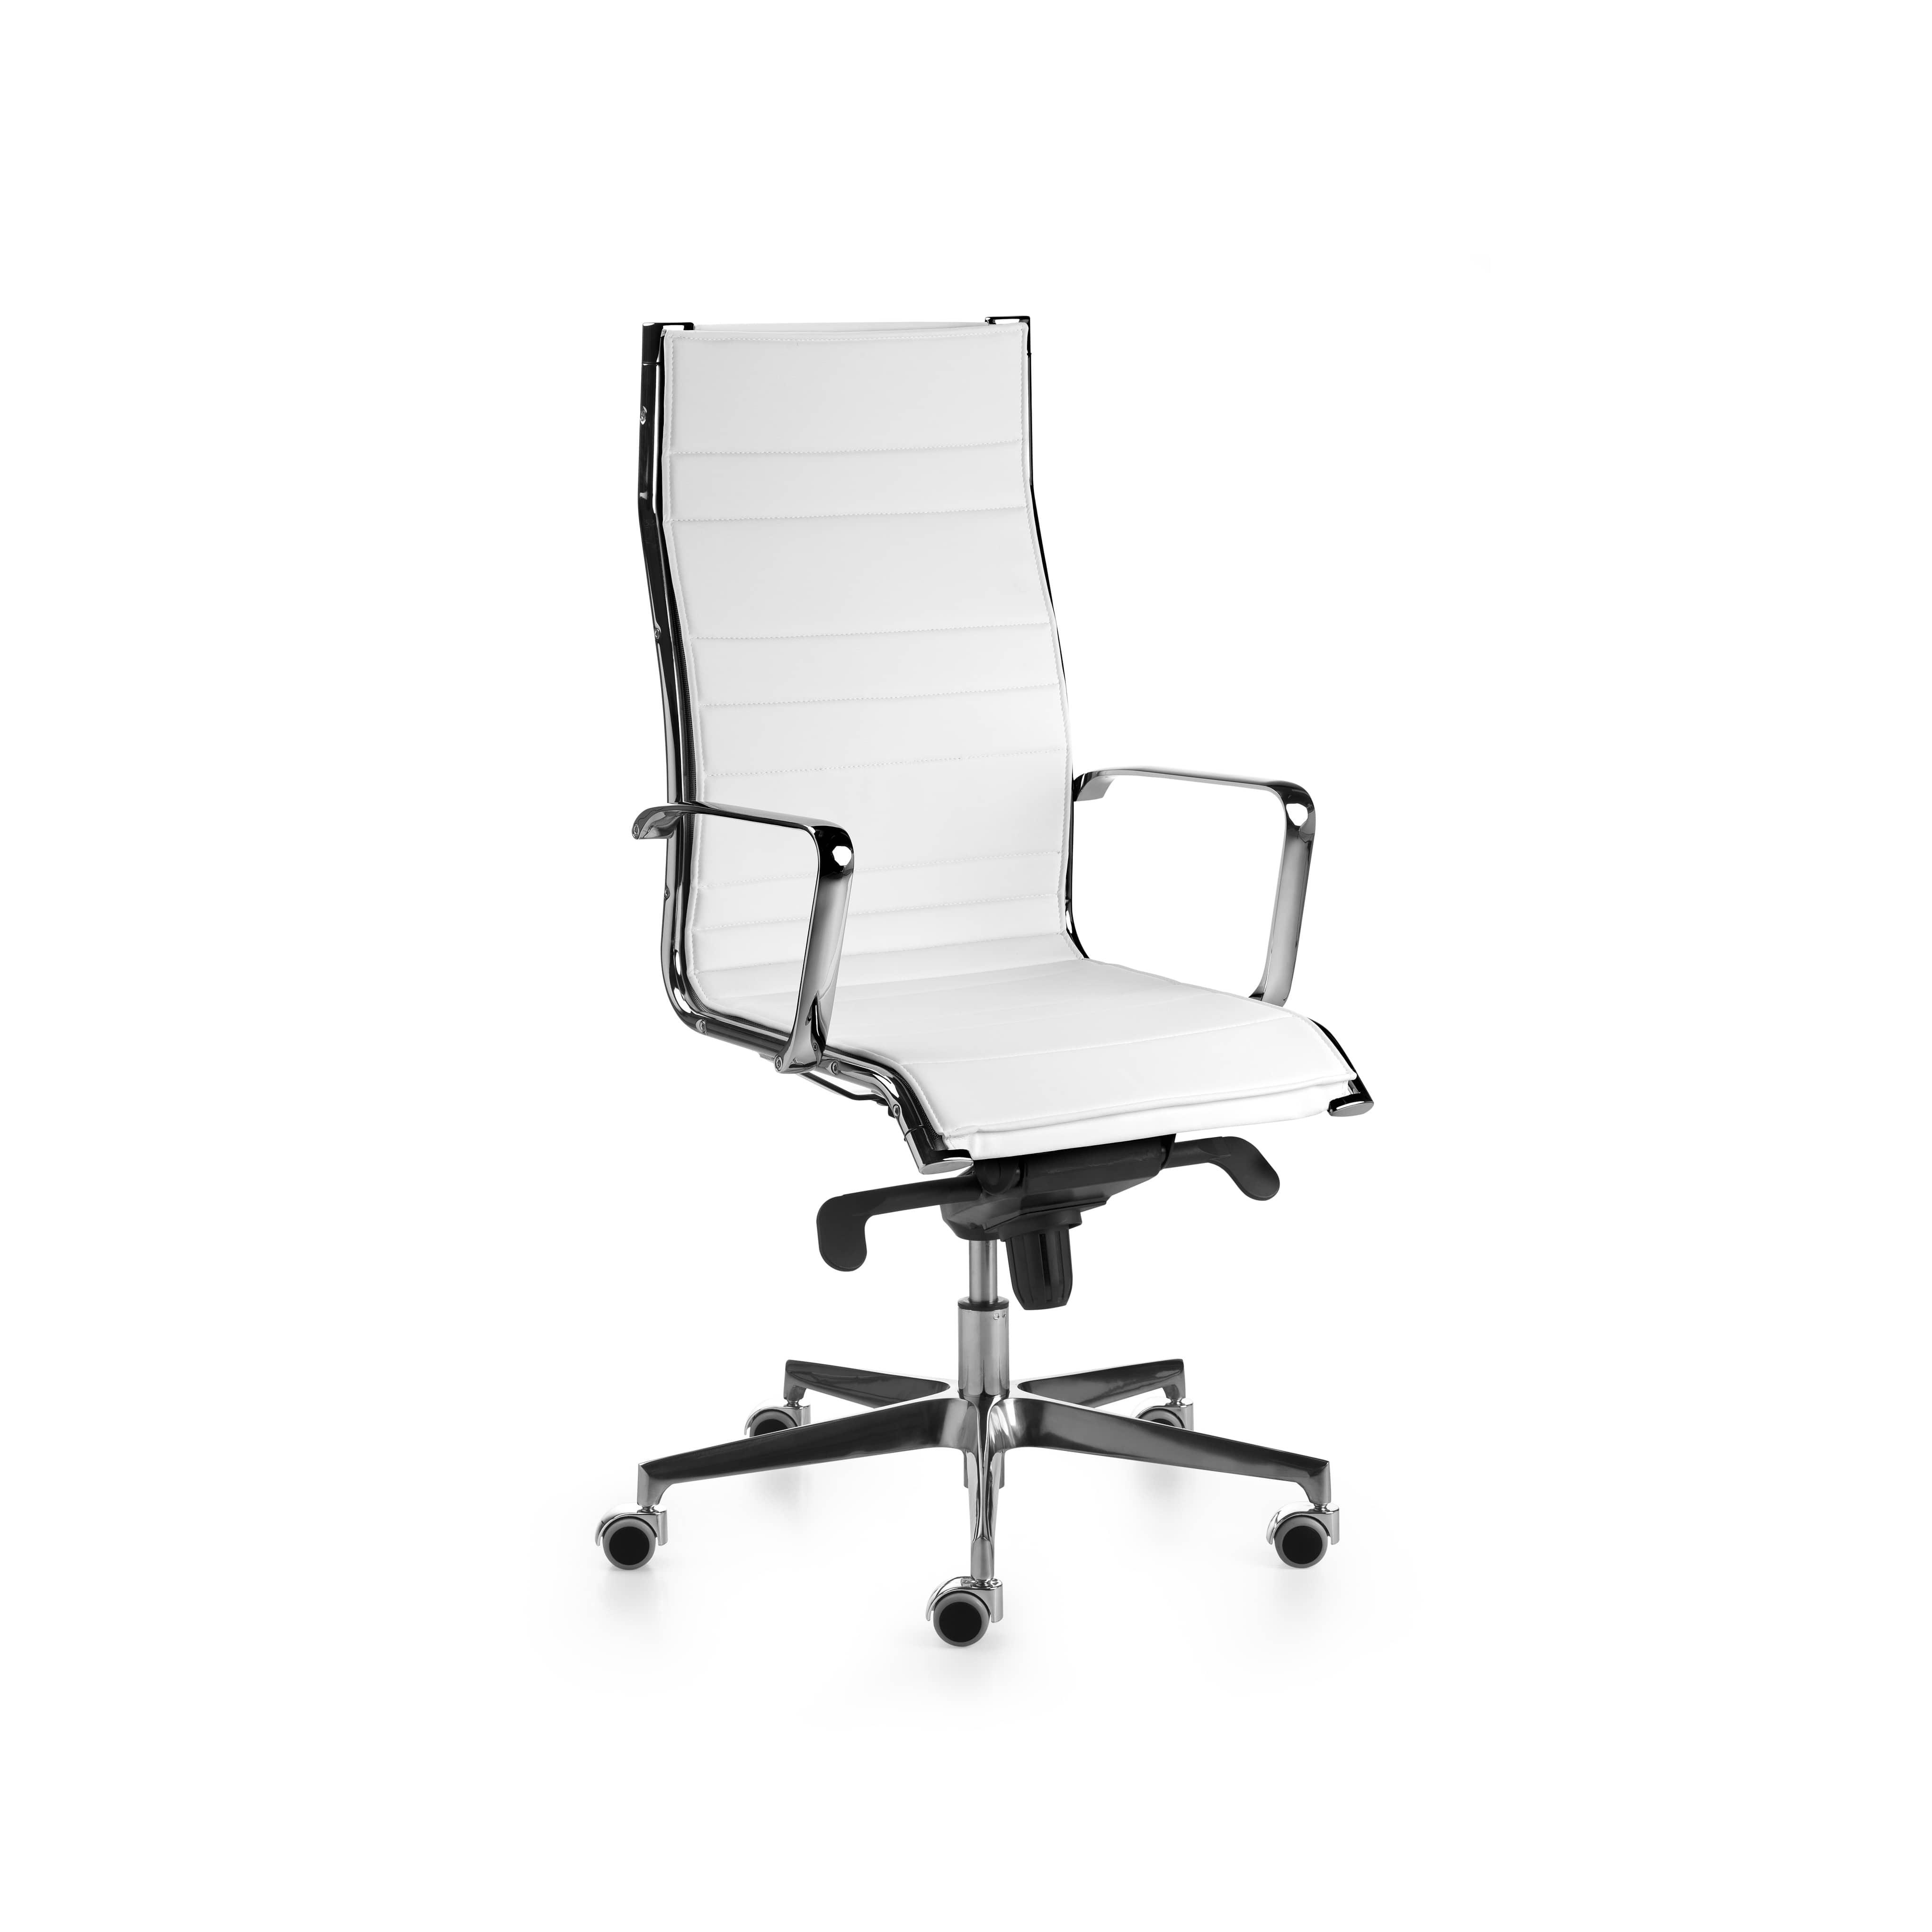 sillas-oficina-General-muebles-paco-caballero-454-5caf5d8bbc6dd